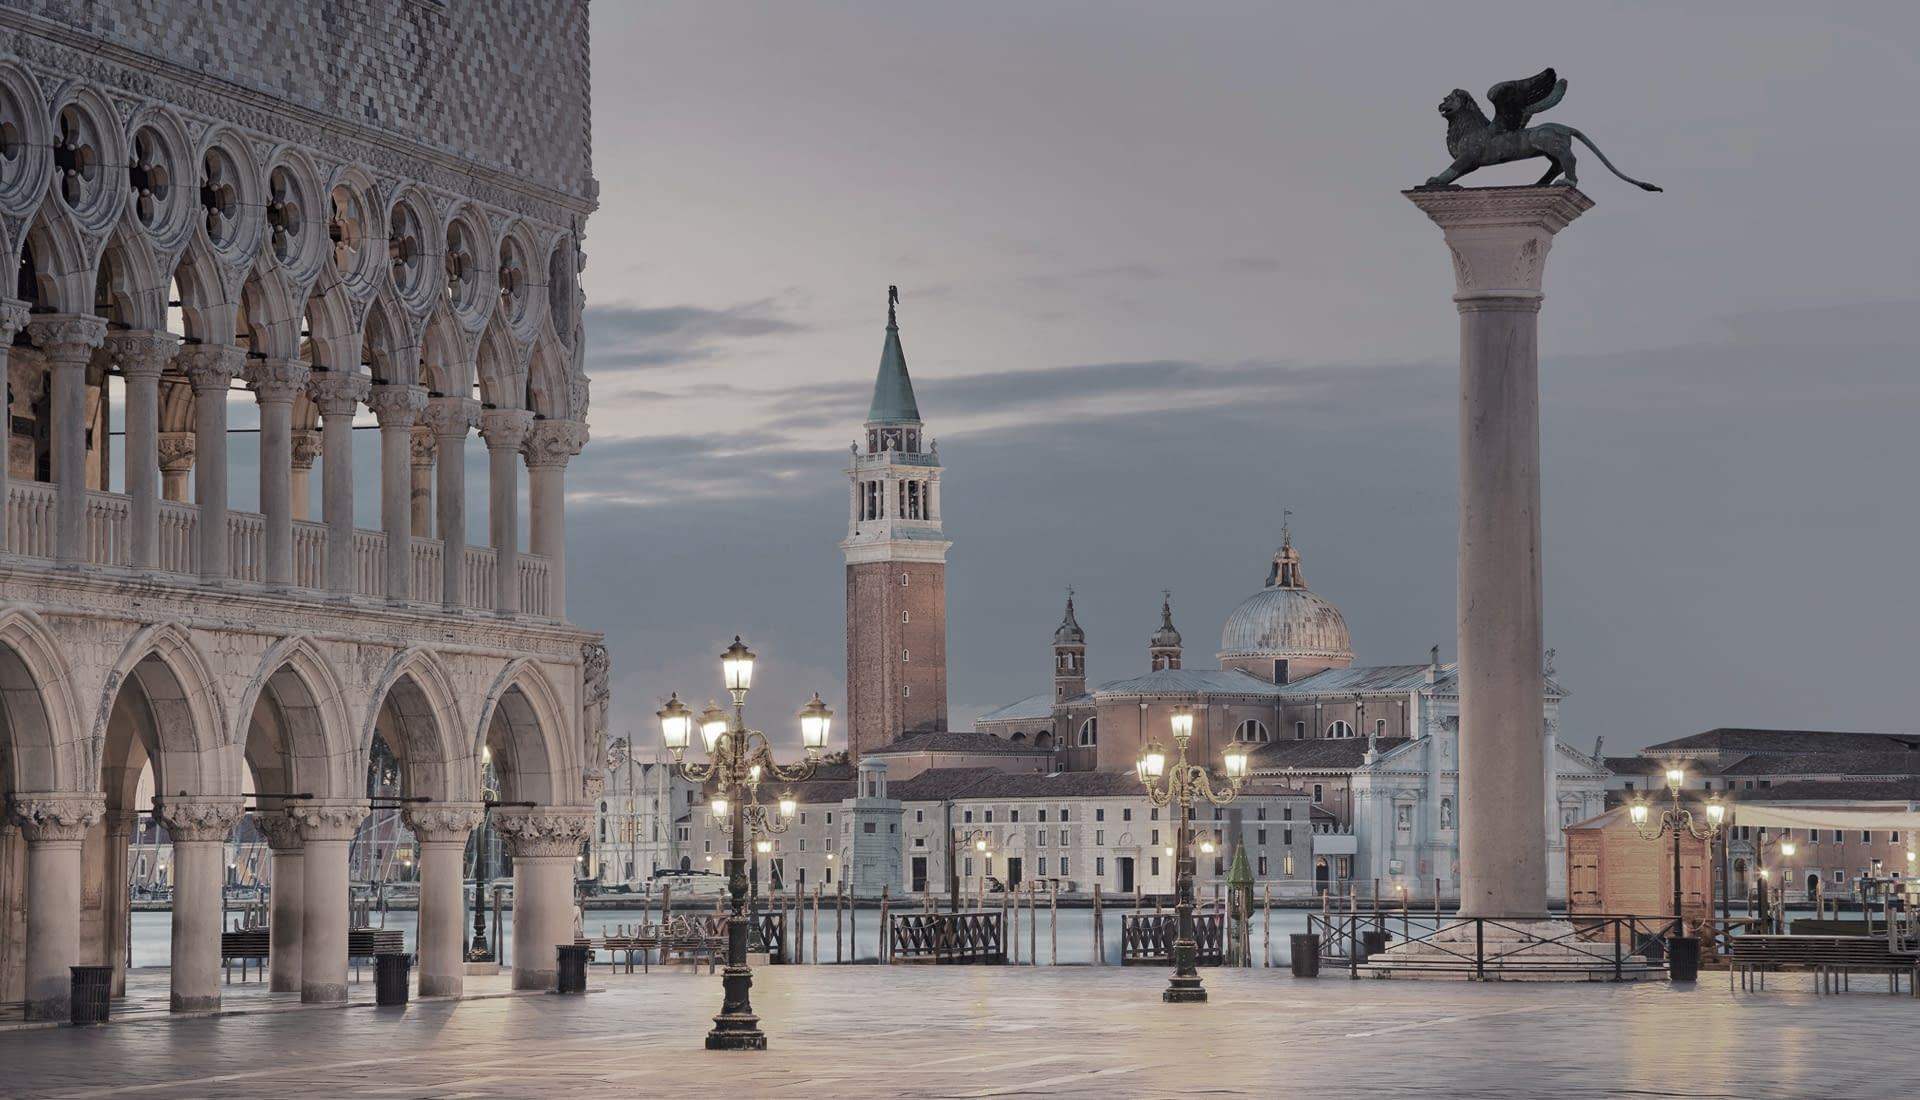 Piazza San Marco - Venezia